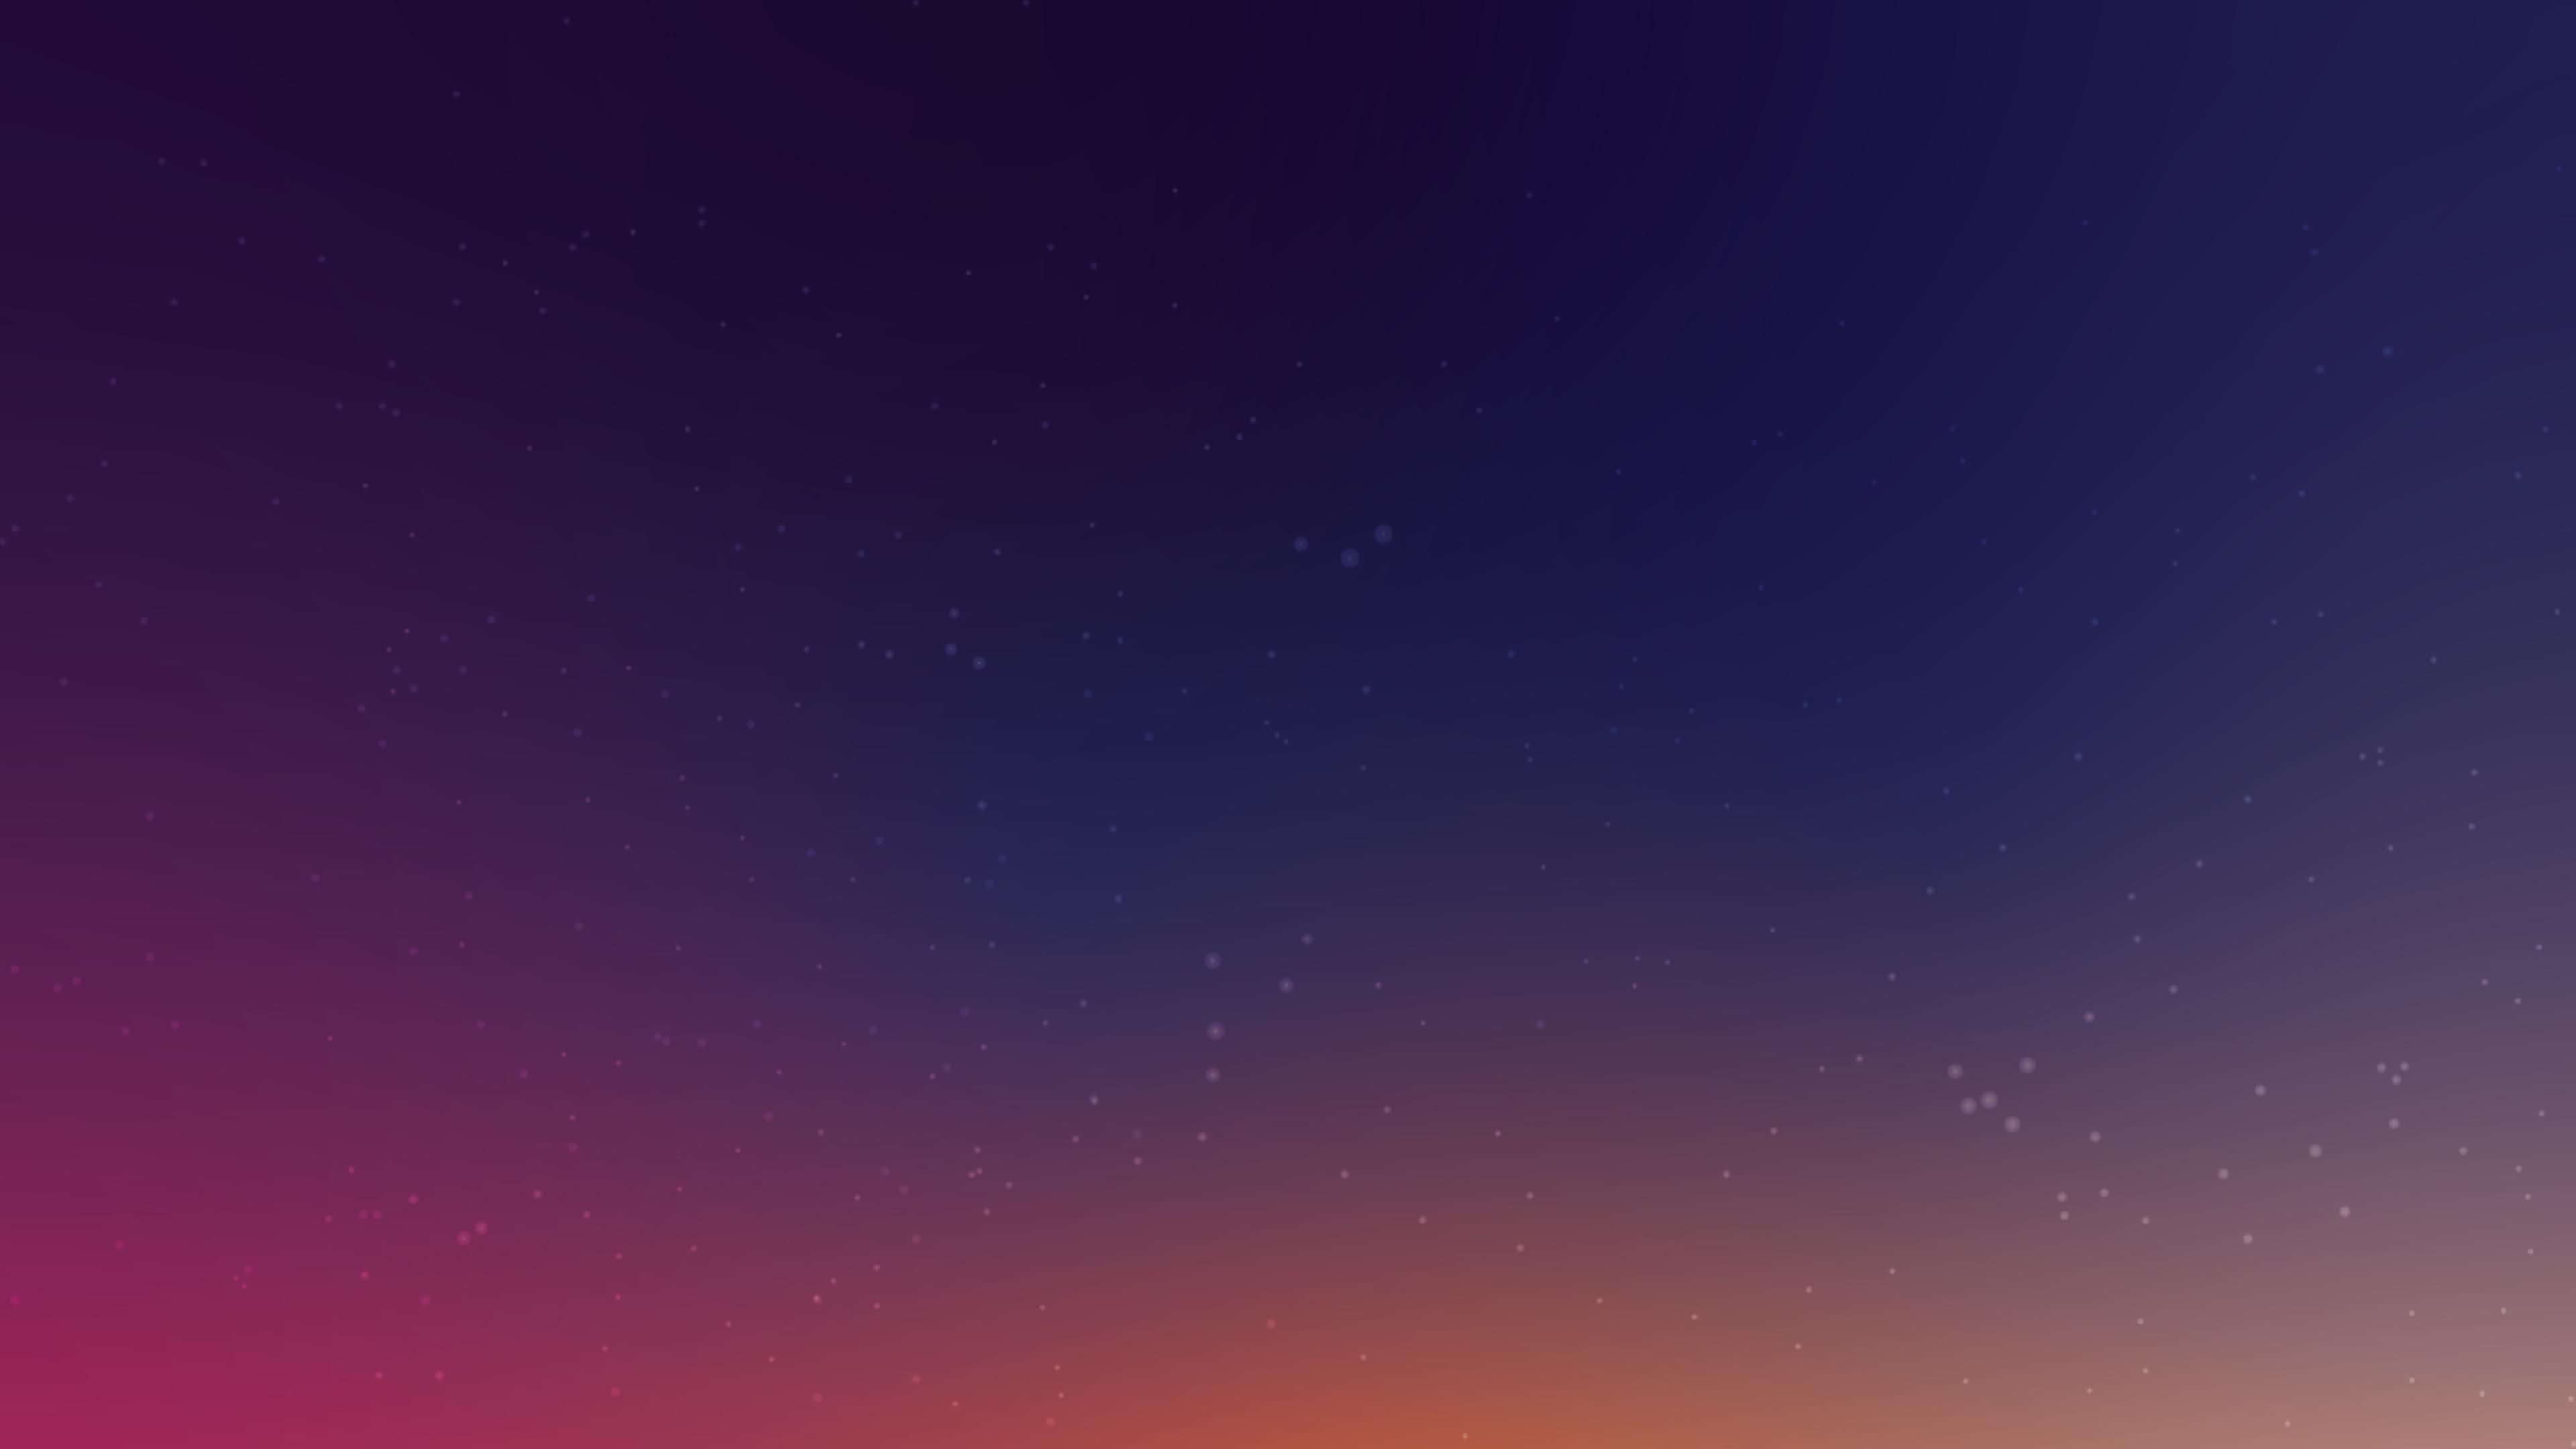 fairwinds_gradient-mesh-5_v2_login_1920x1080@2x